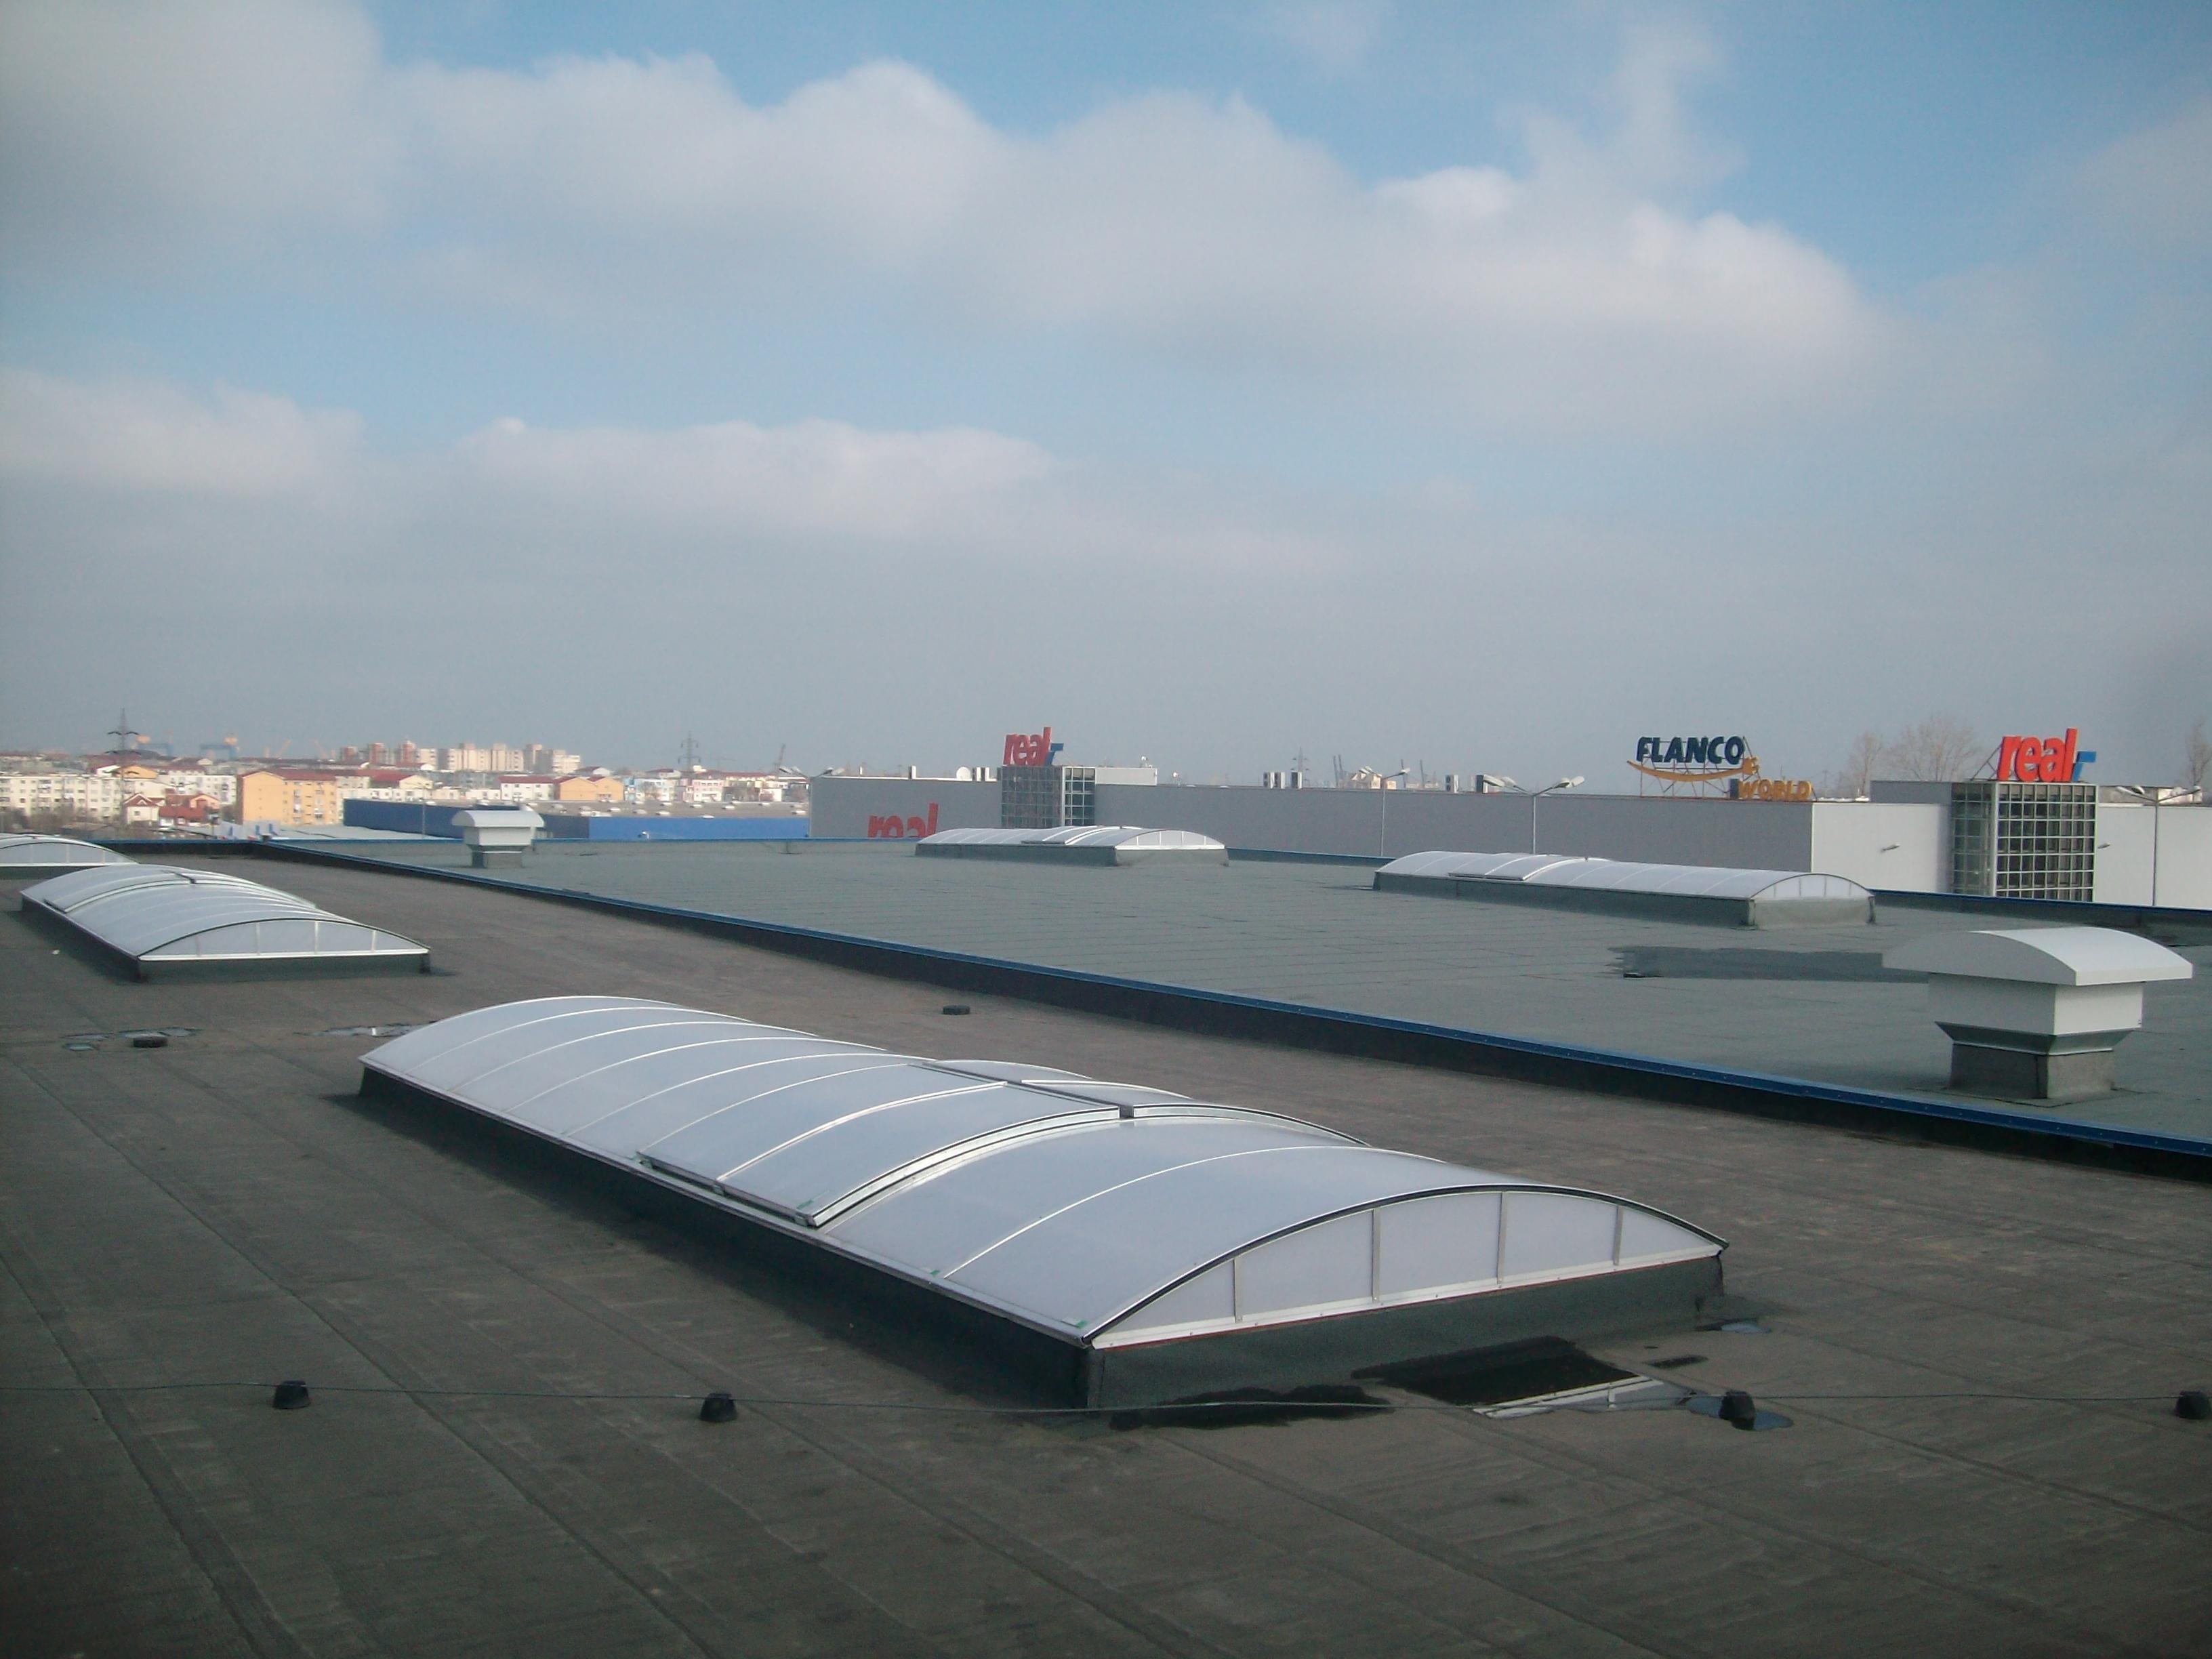 Luminatoare industriale - Spatiu comercial Praktiker - Constanta HEXADOME - Poza 1